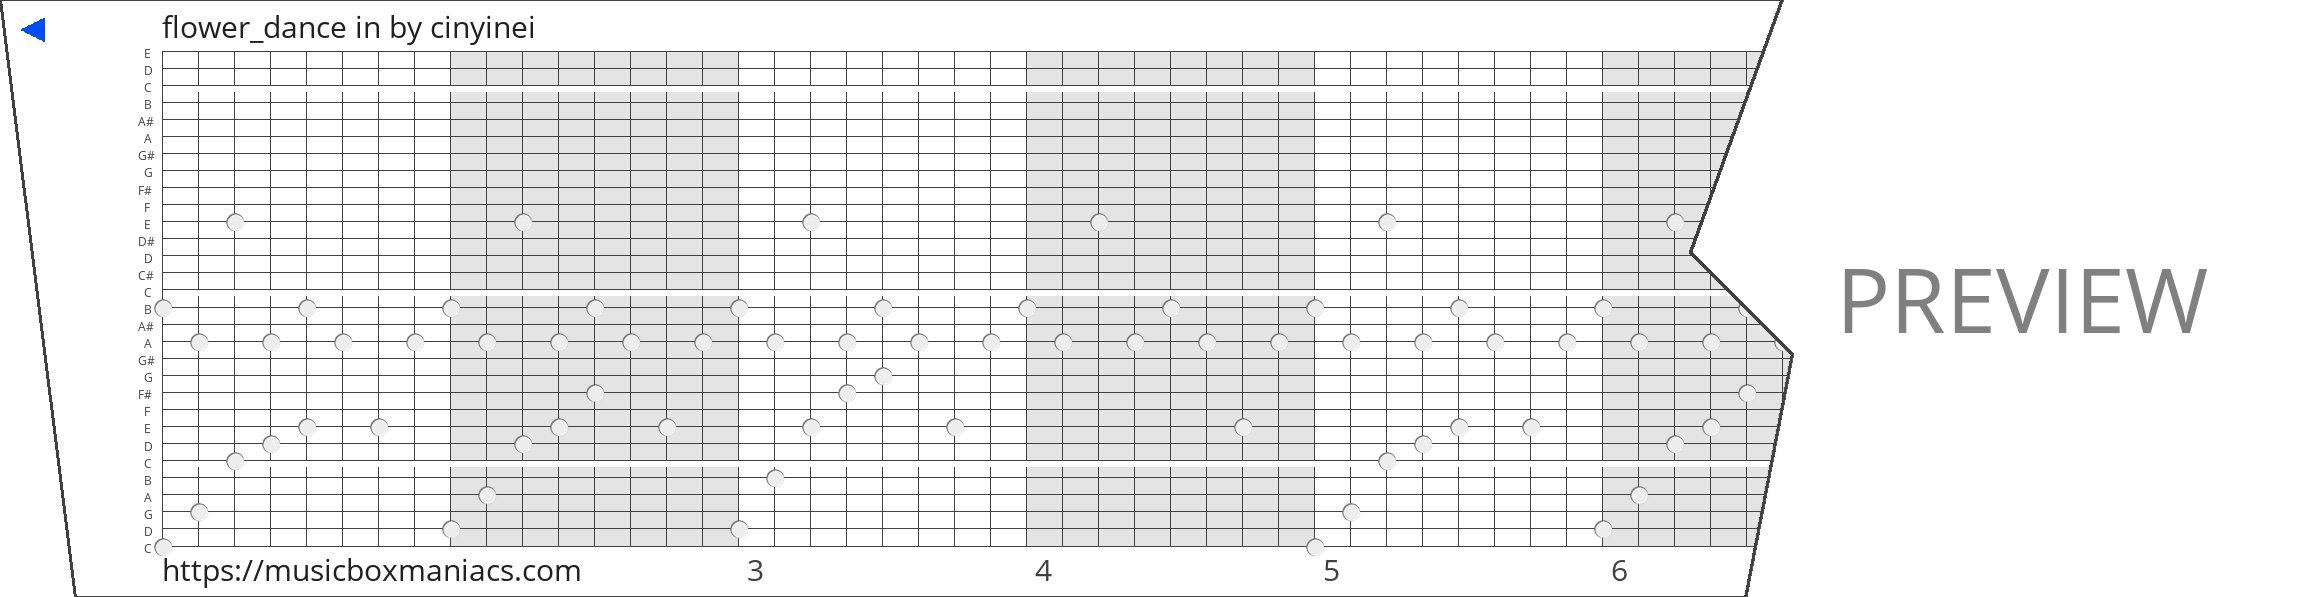 flower_dance in 30 note music box paper strip